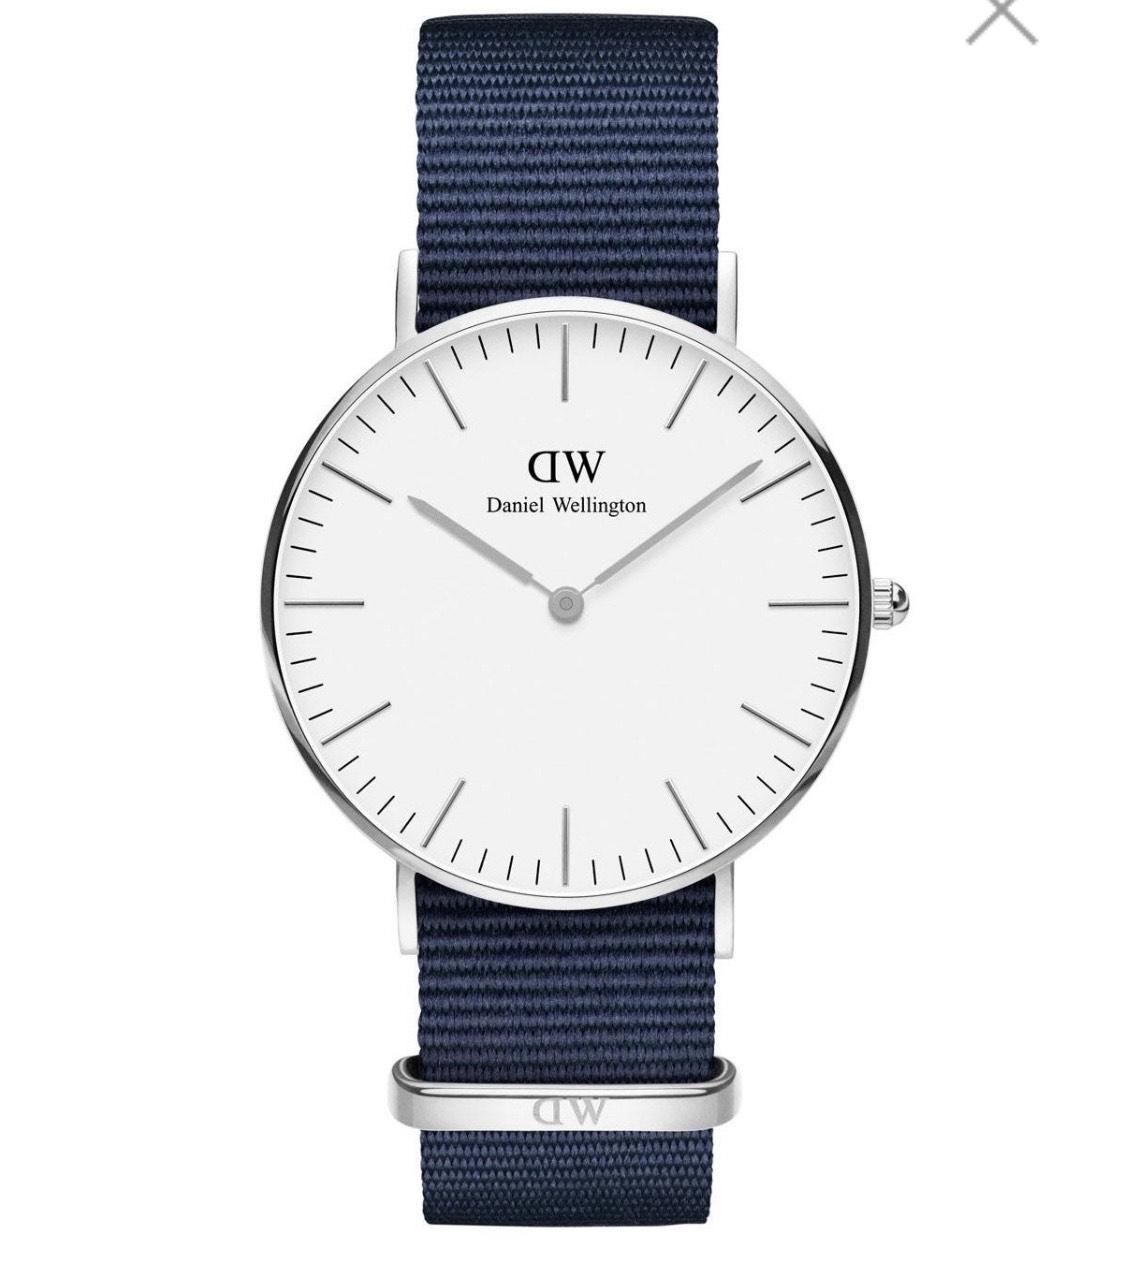 Daniel Wellington 40mm Bayswater Watch £69 at Fraser Hart